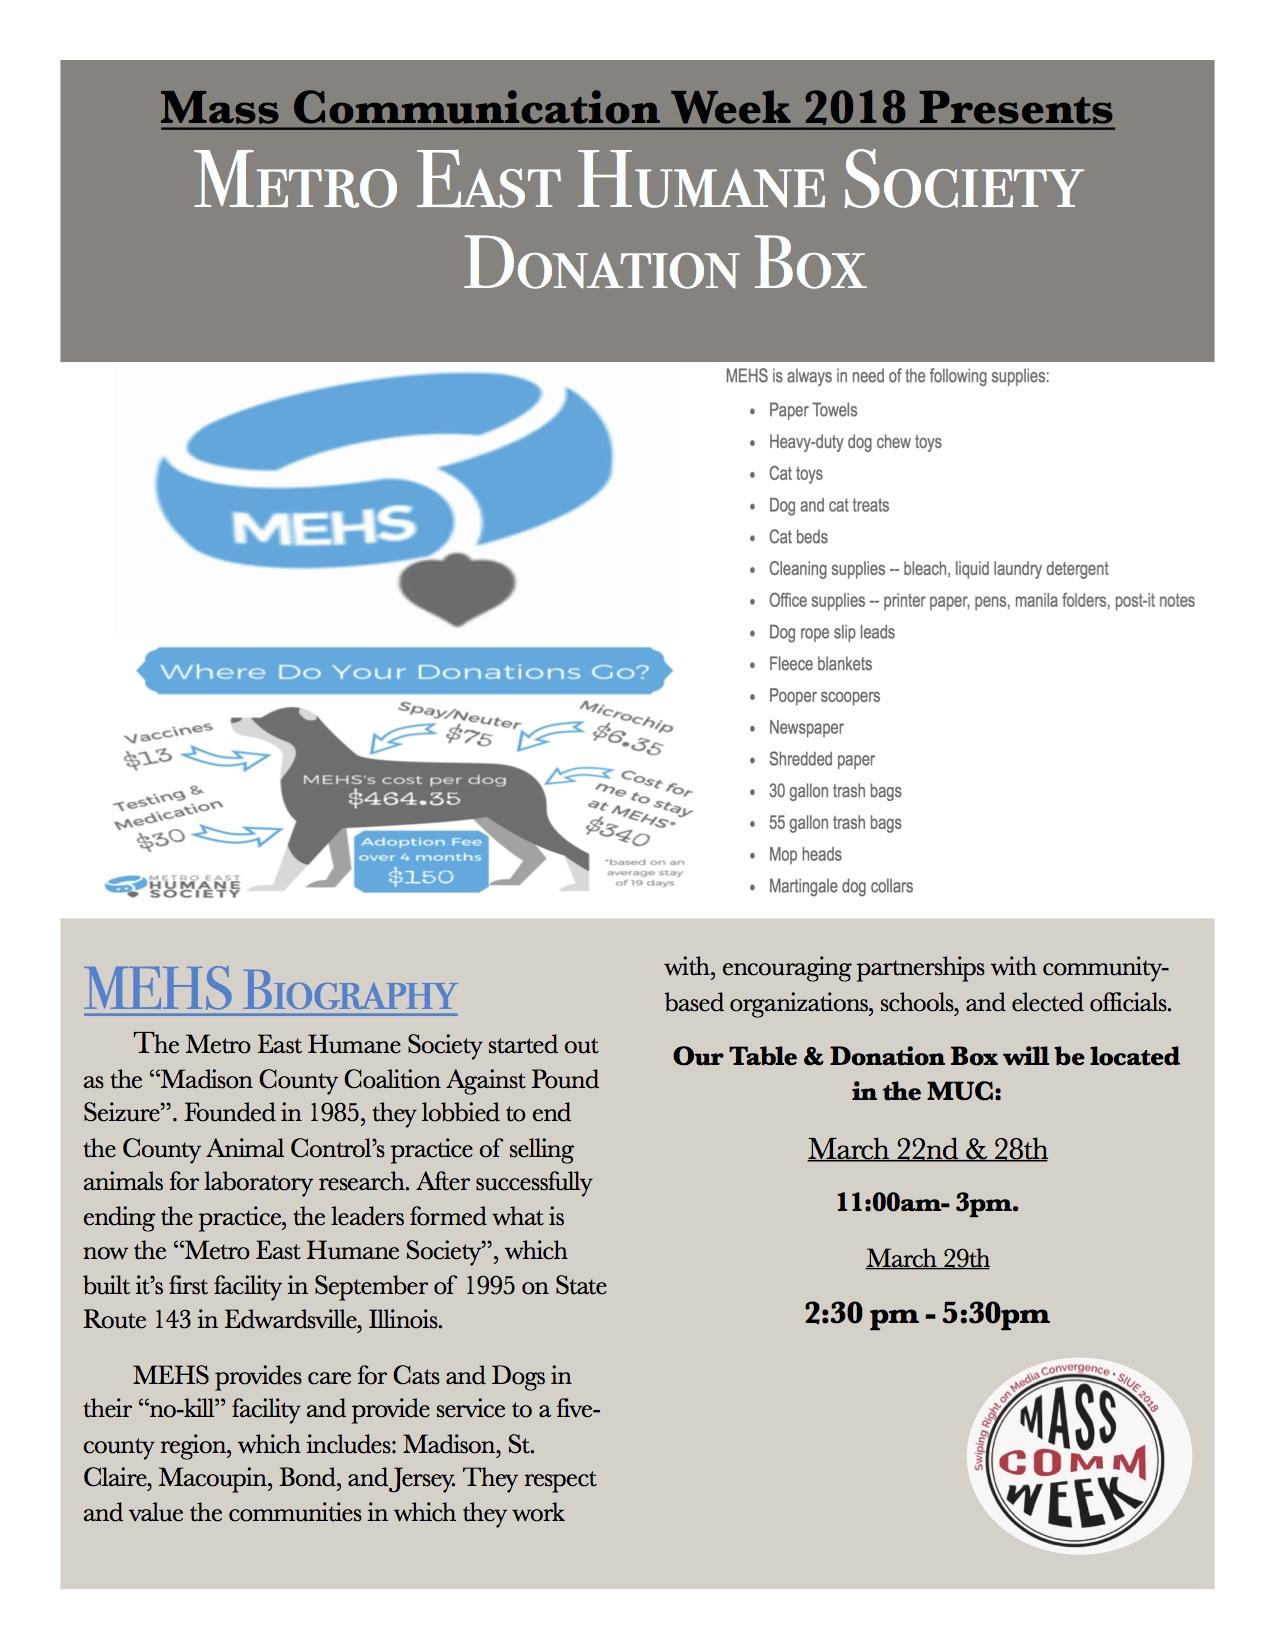 Metro East Humane Society Donations!!! – Communiqué